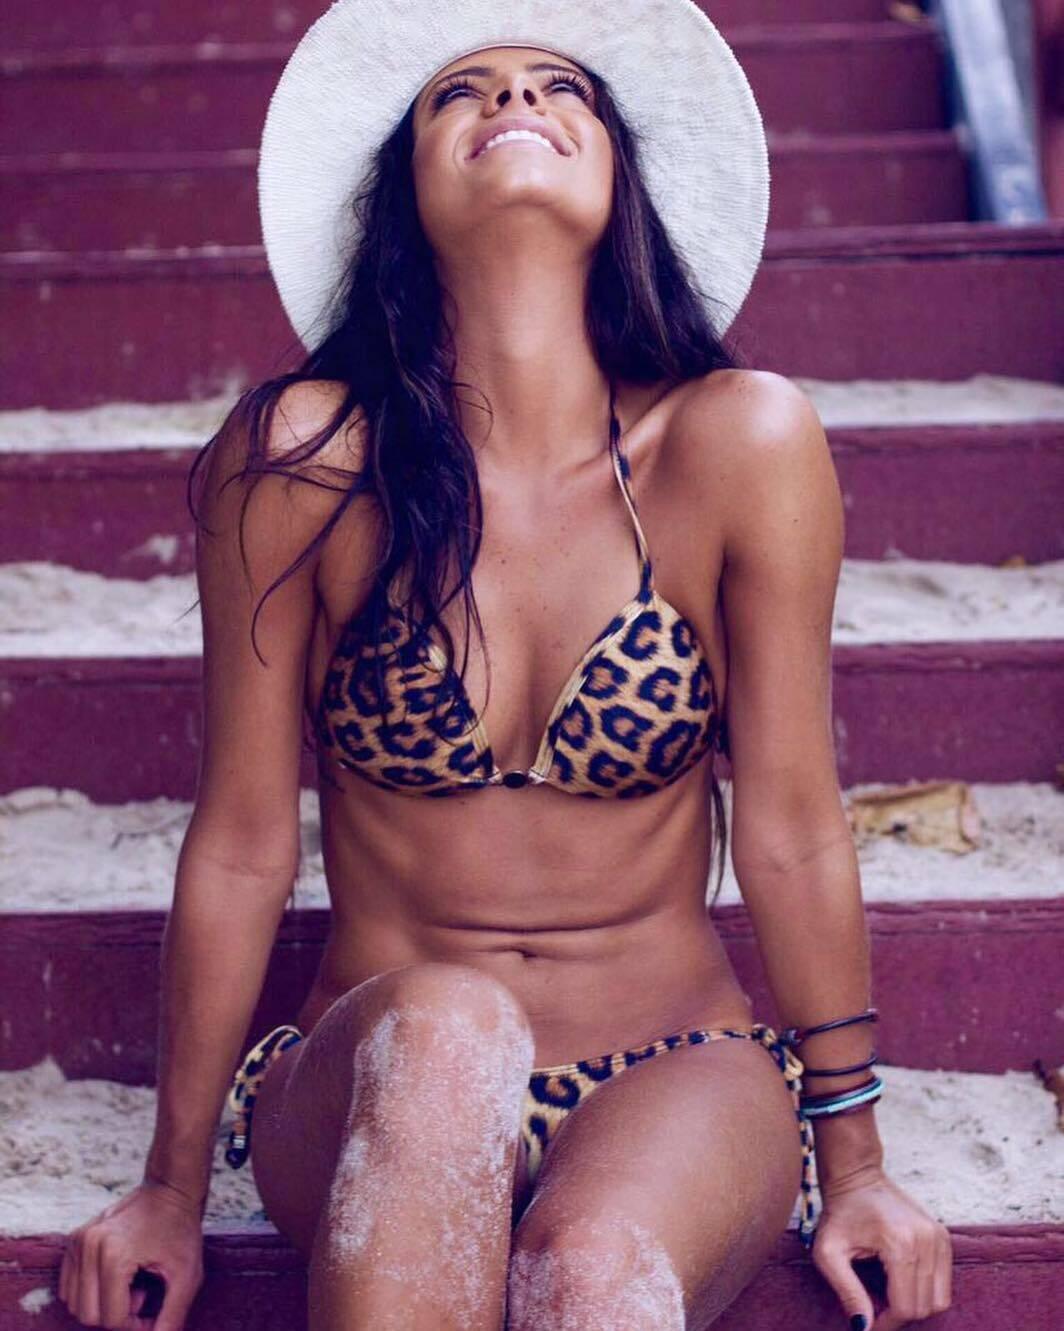 Лума Симойнш в леопардовом купальнике